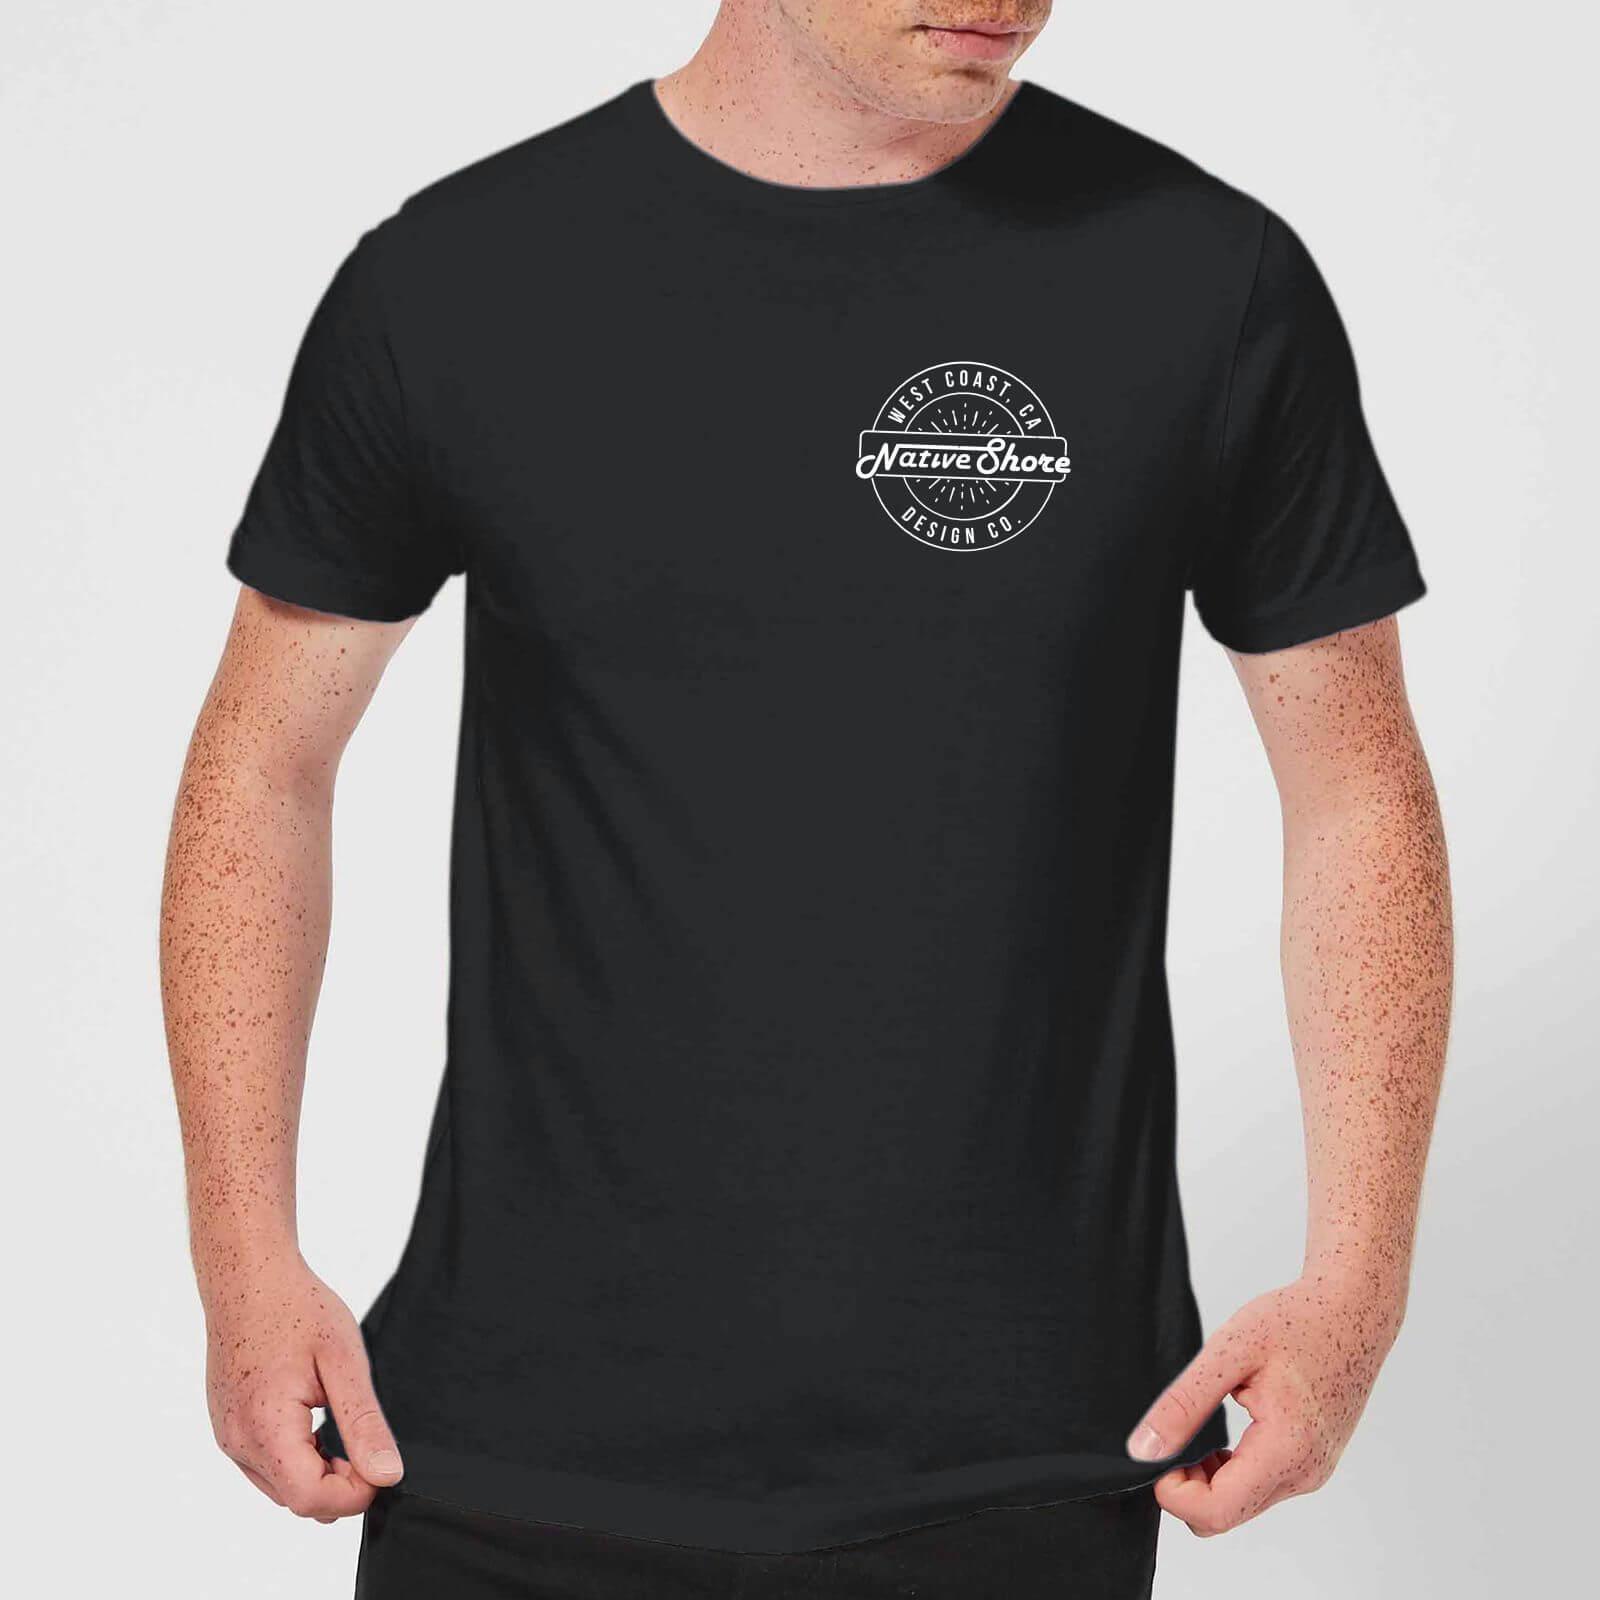 Native Shore Men's West Coast T-Shirt - Black - L - Black